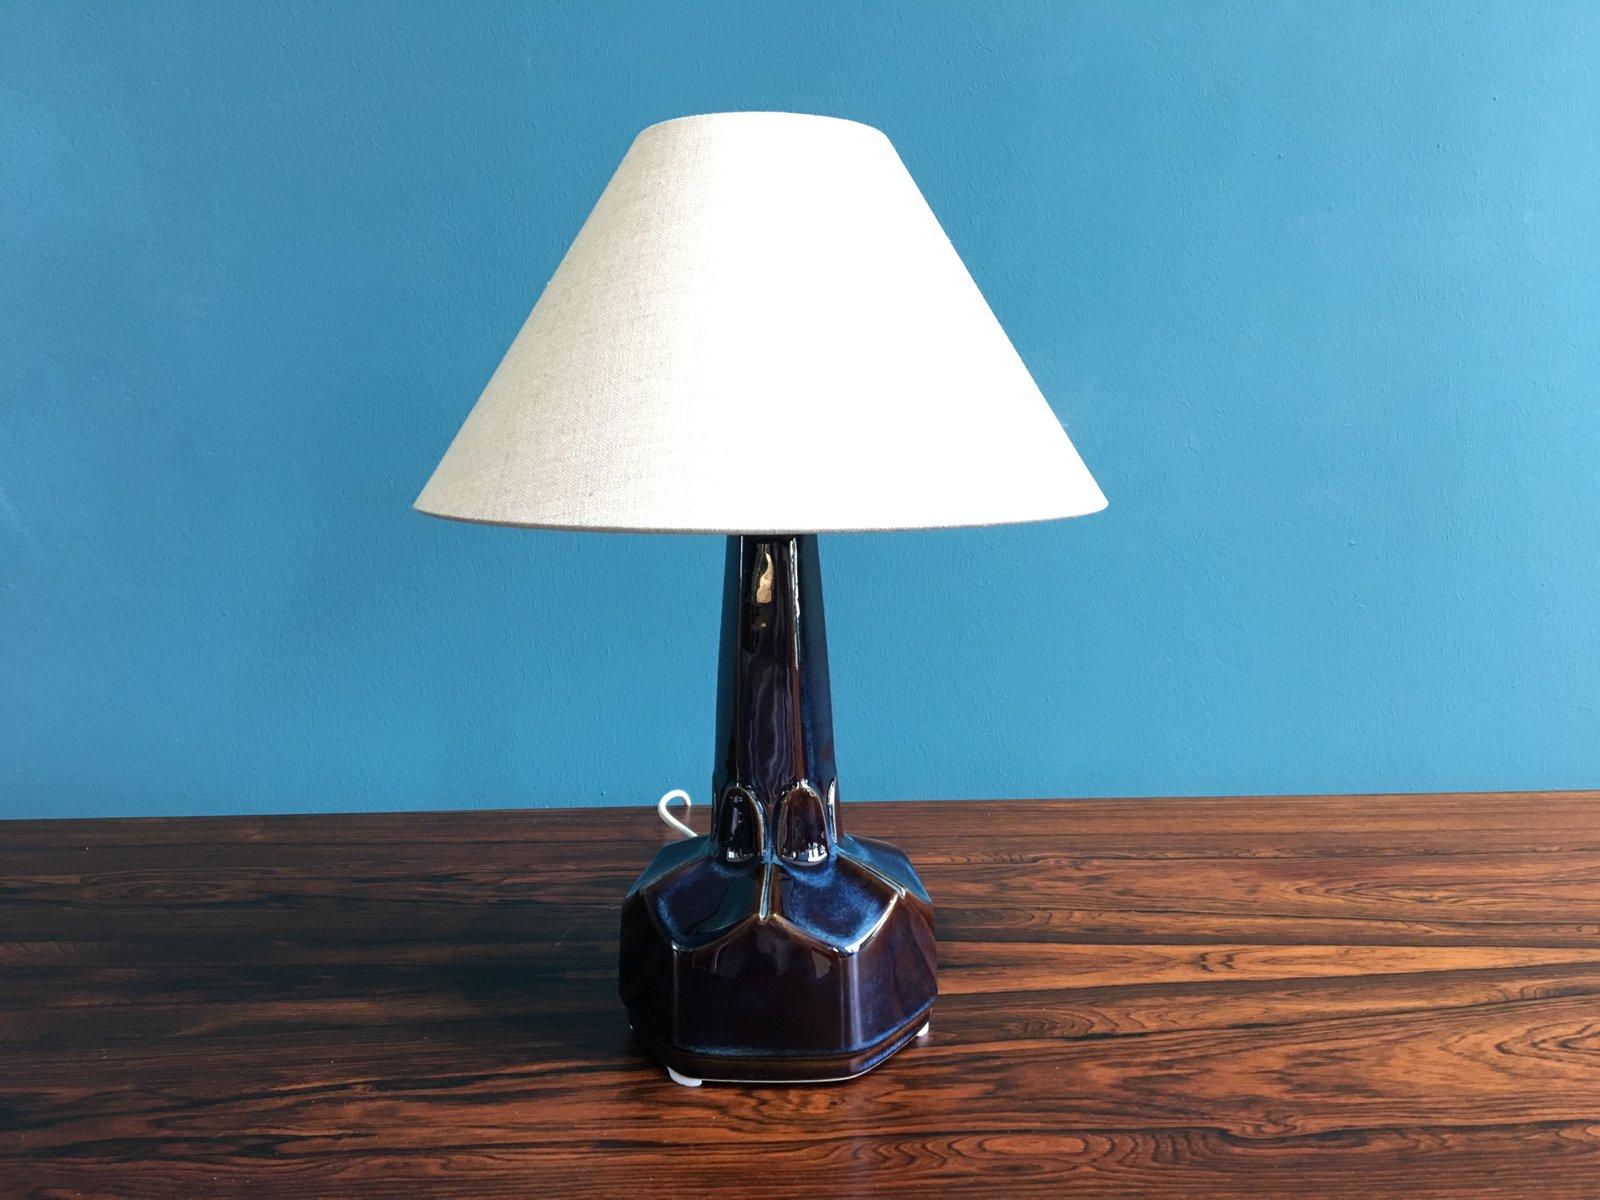 Small Danish Ceramic Table Lamp By Einar Johansen For Soholm Stentoj